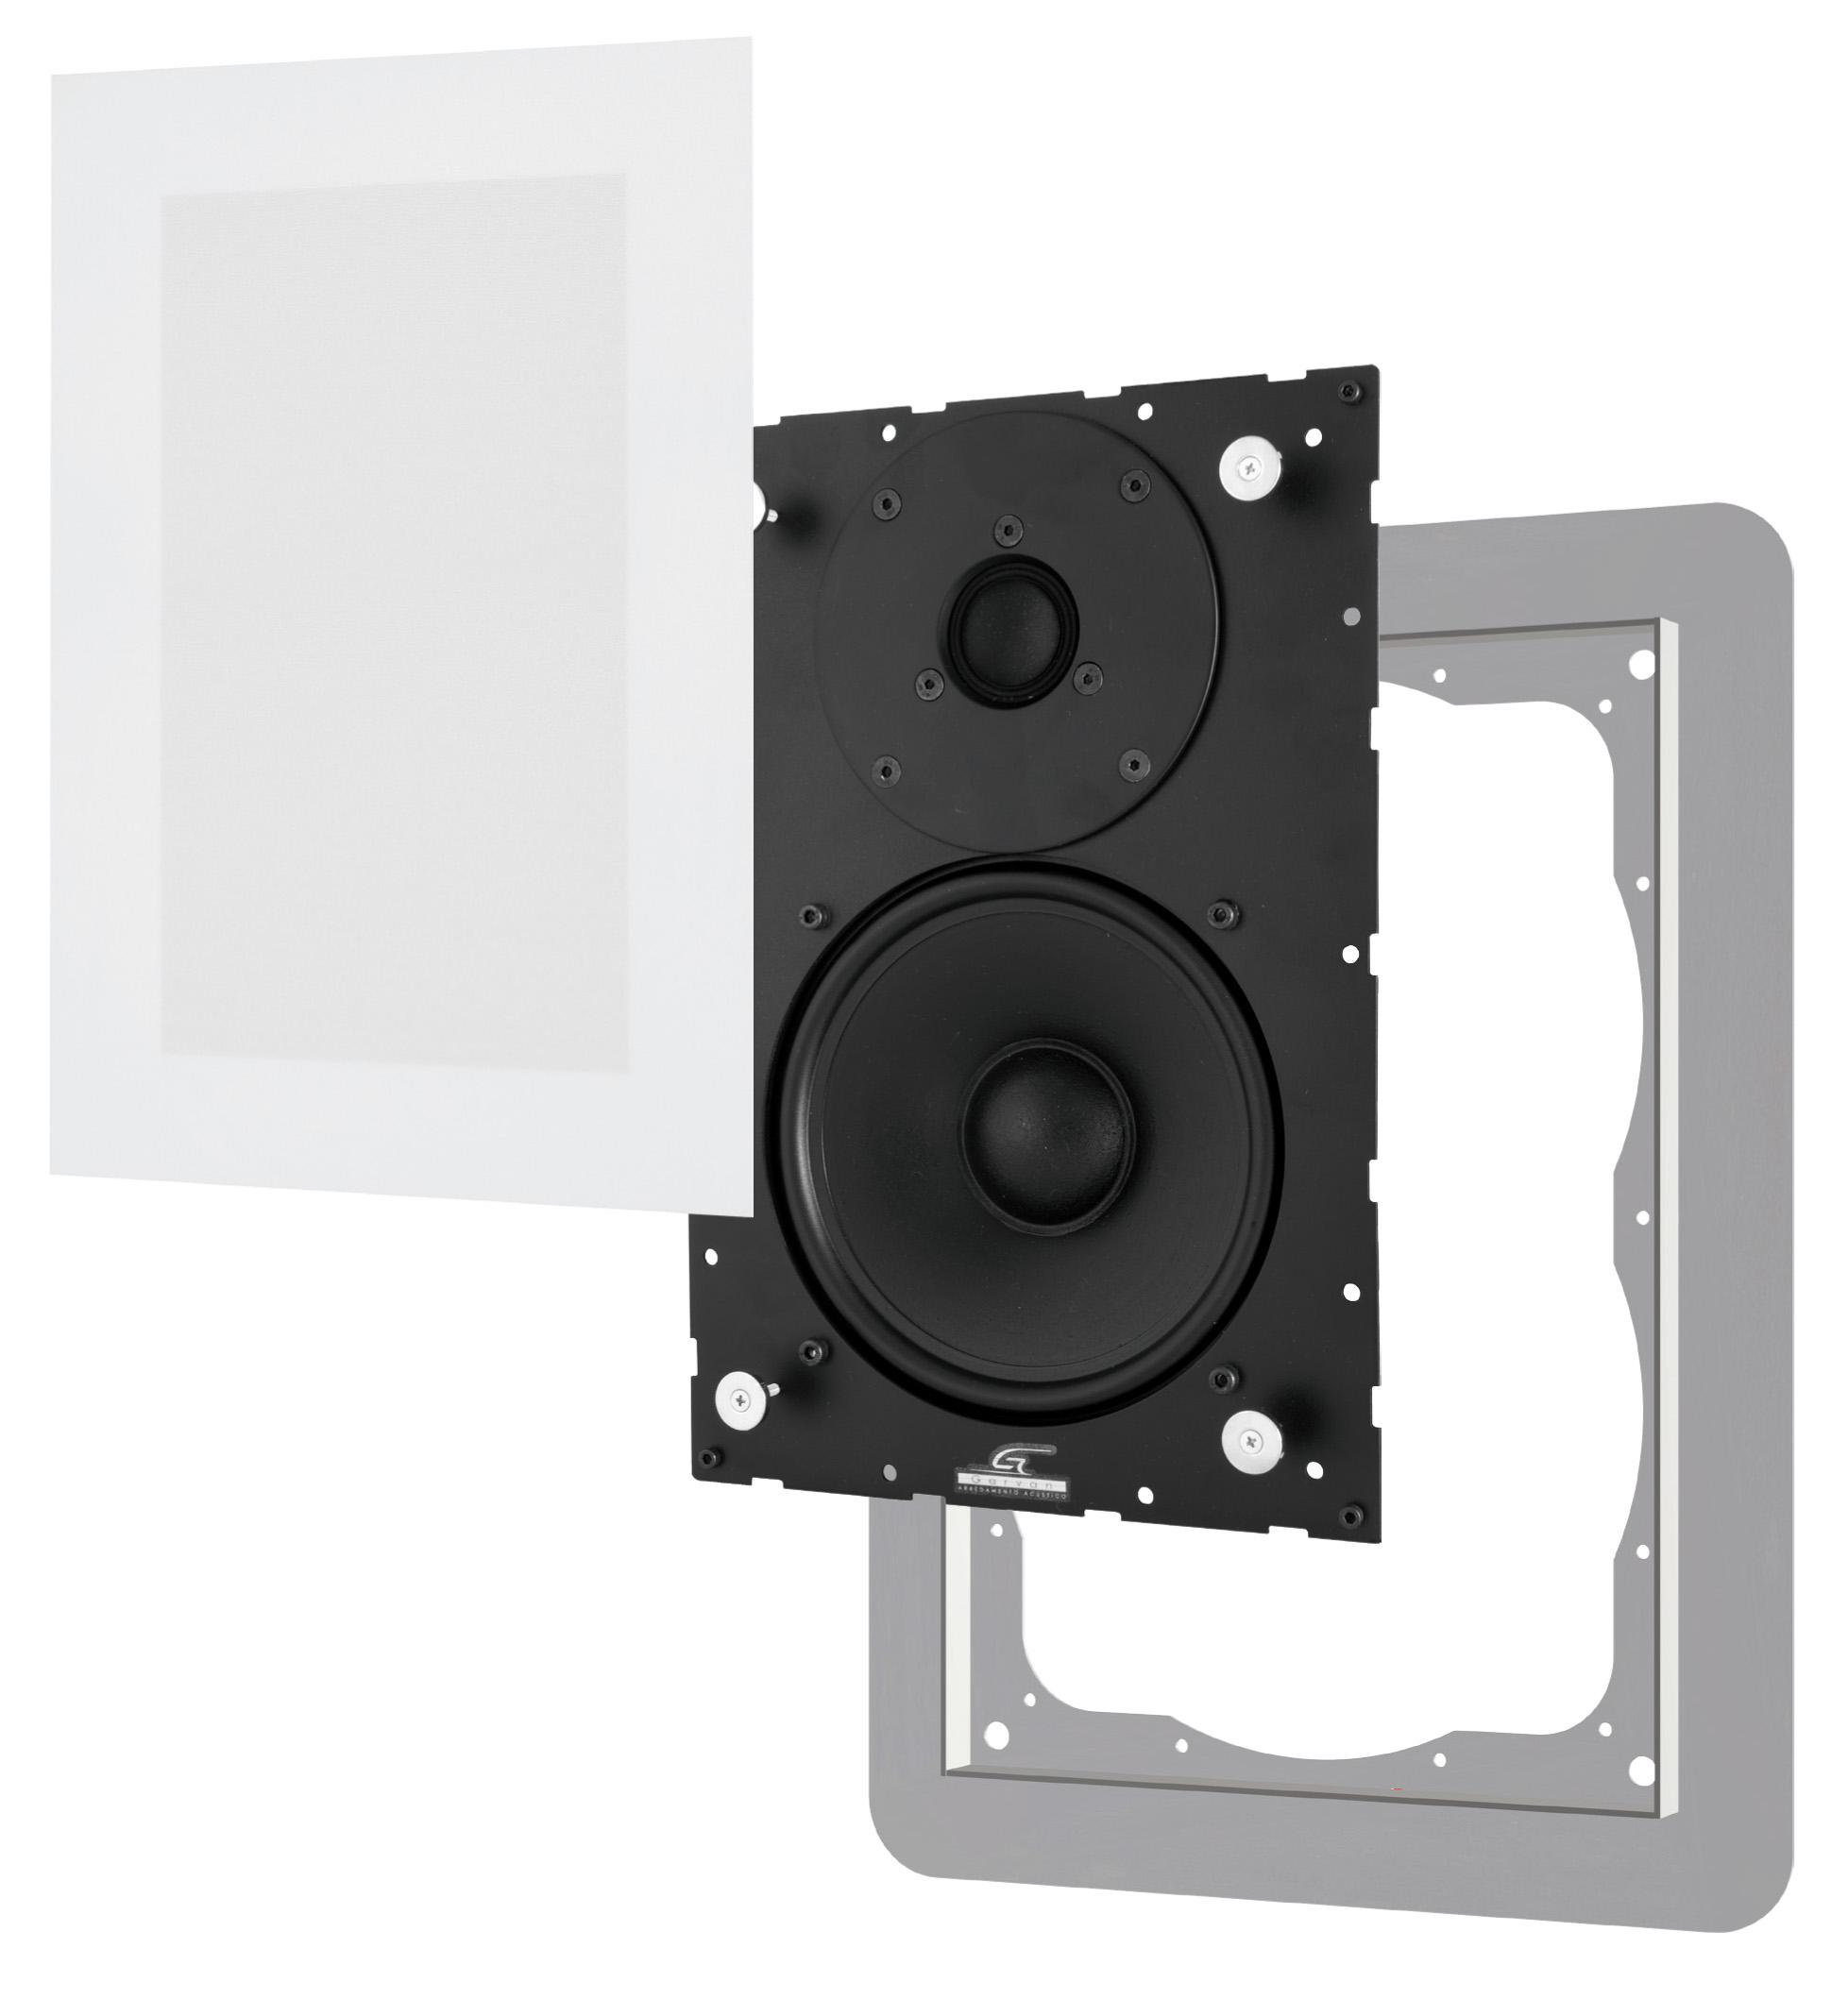 Sic216 Garvan diffusori acustici da incasso filo muro